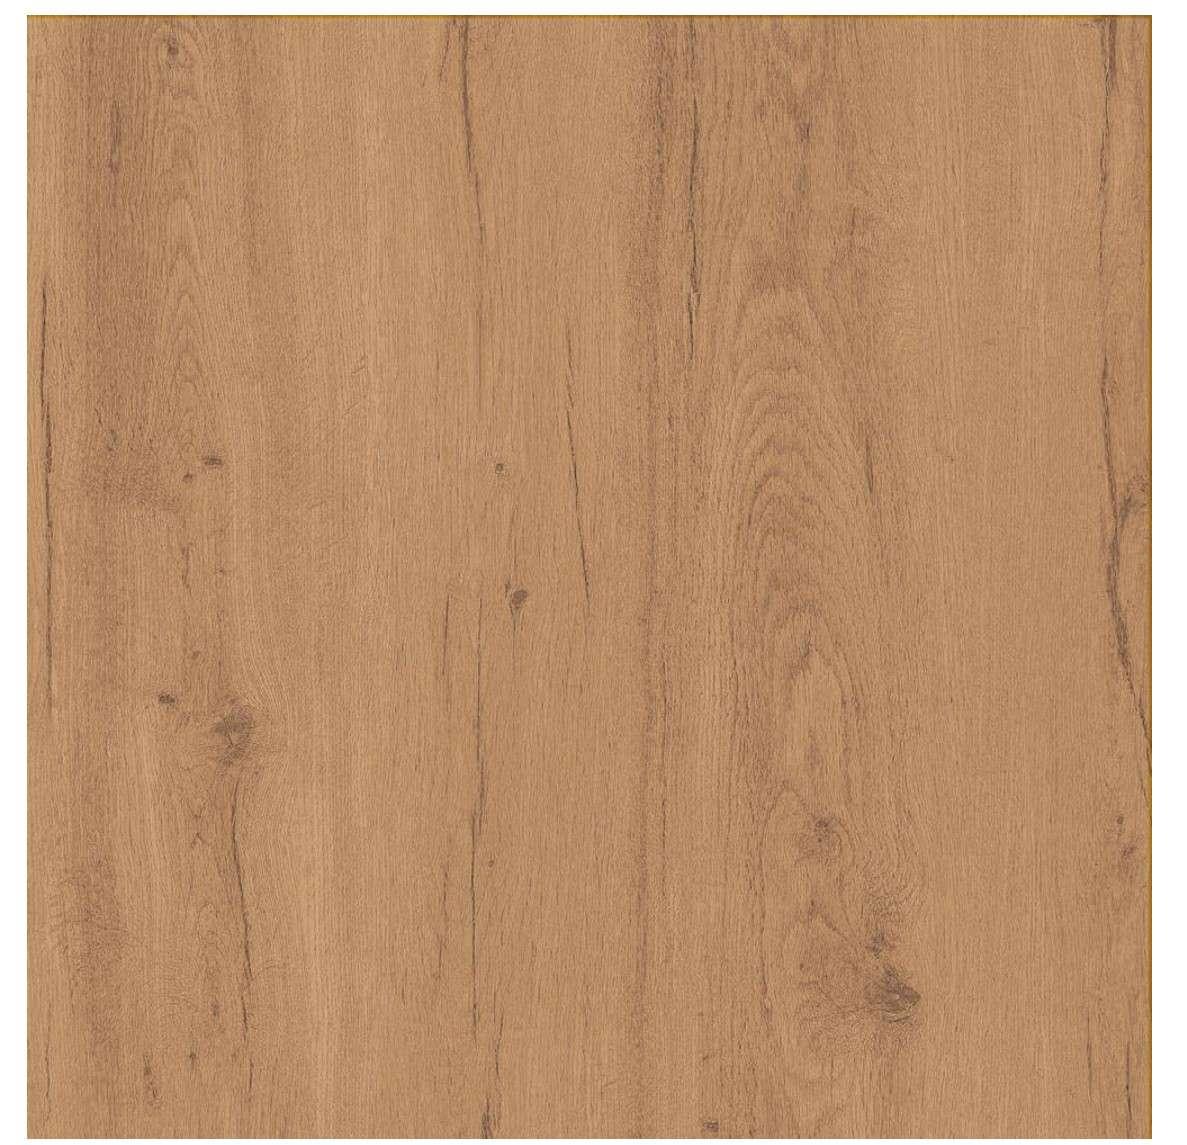 LIFEPROOF Essential Oak Luxury Vinyl Plank Flooring